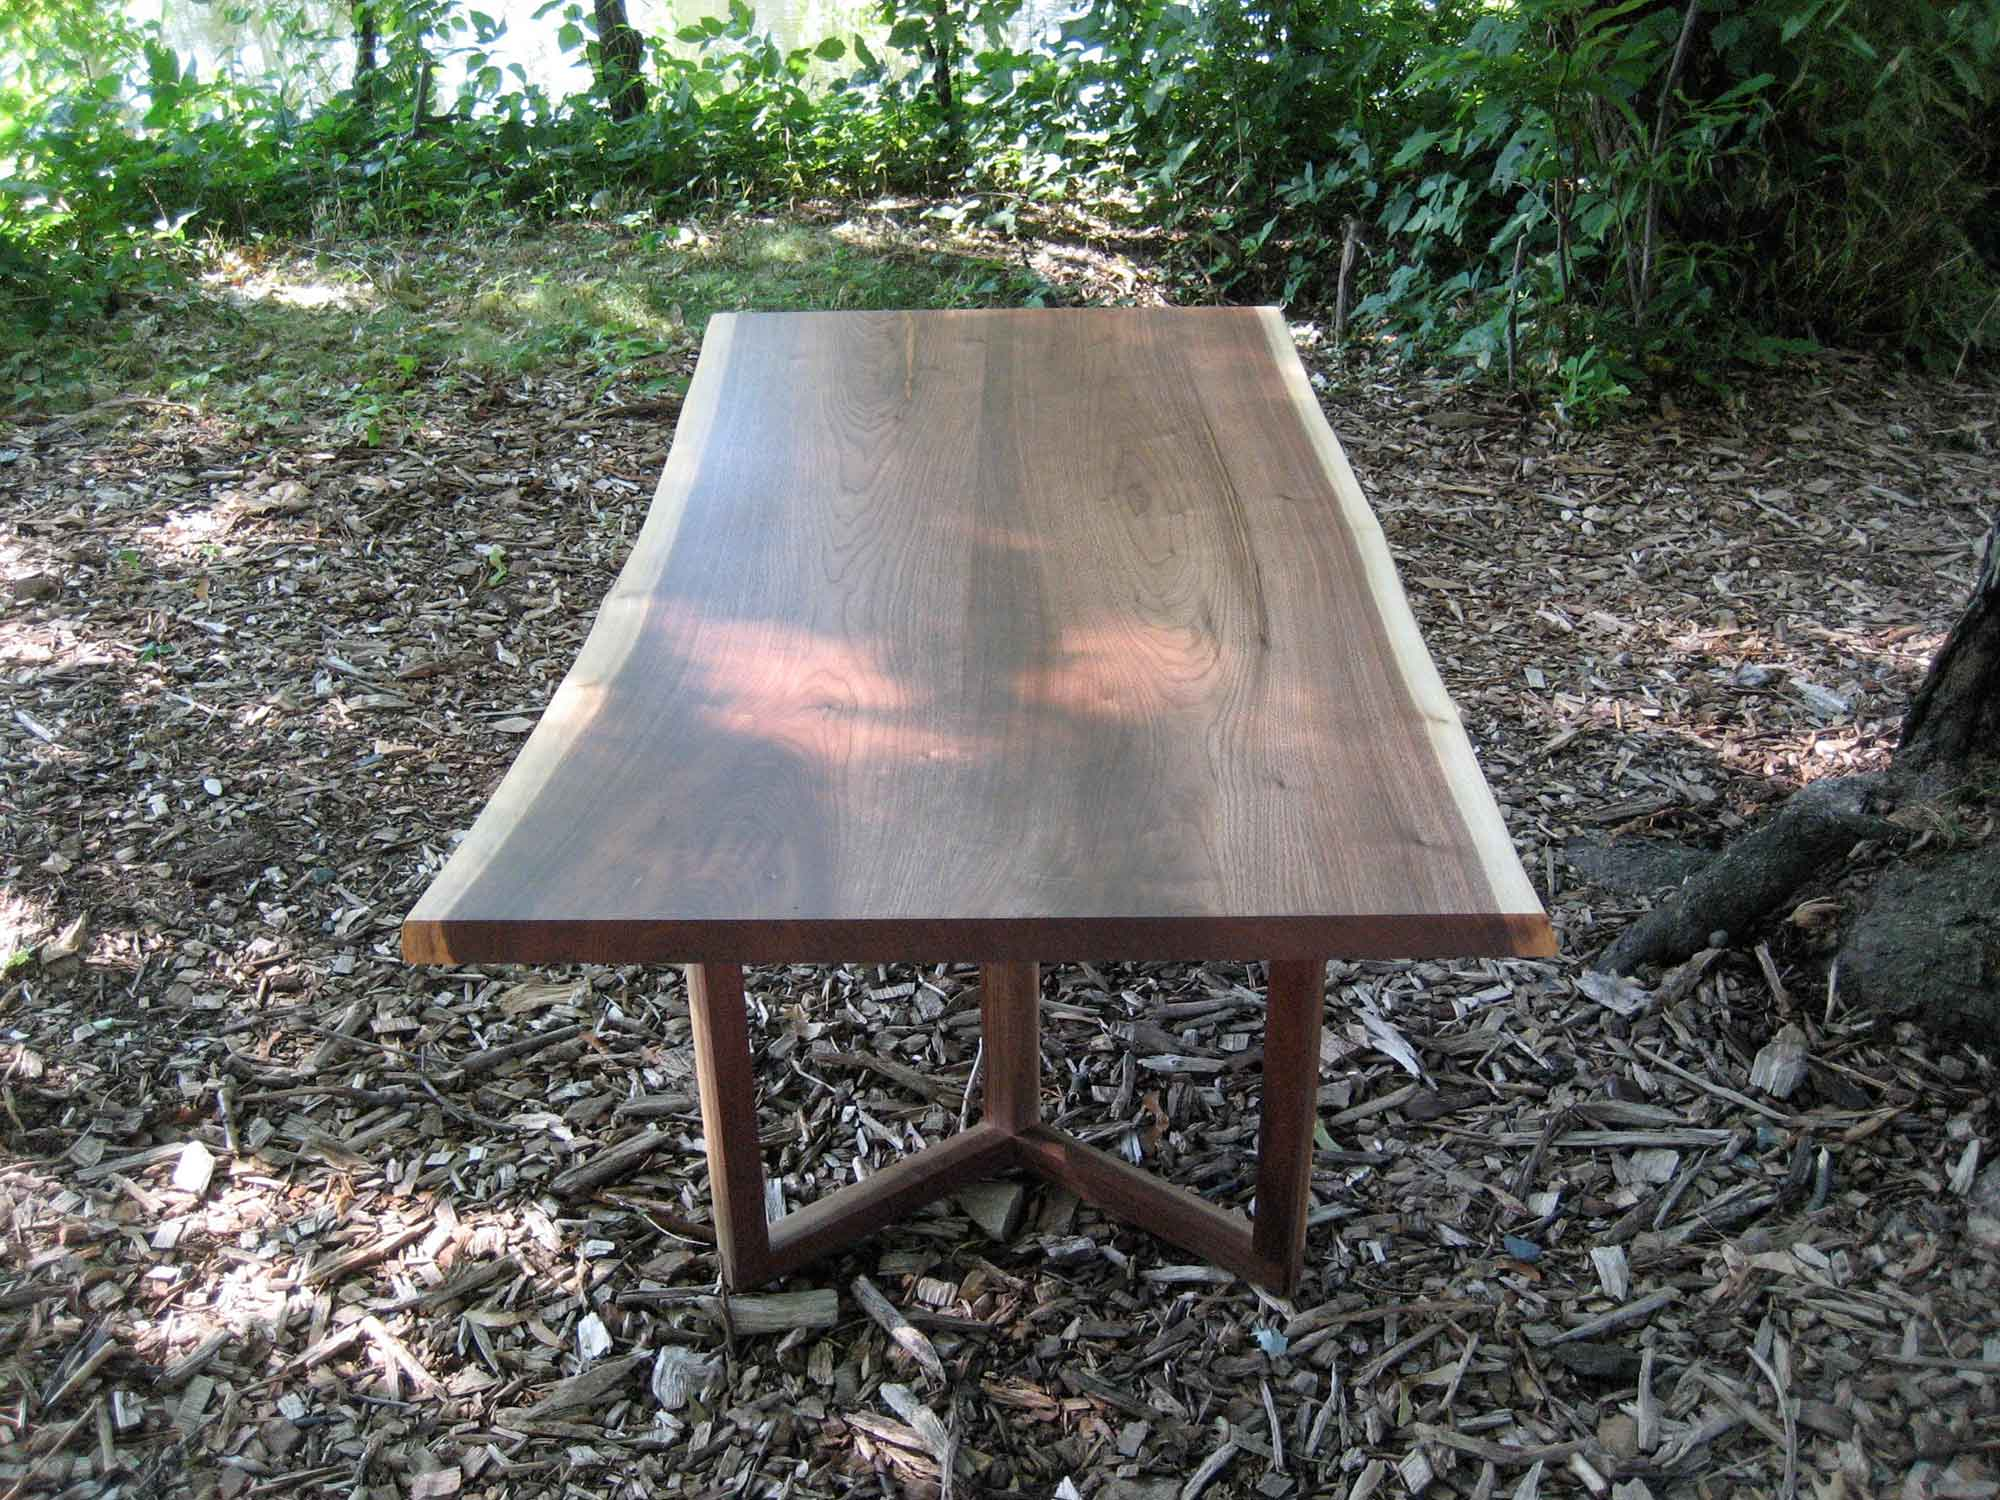 wickham-open-chevron-coffee-table-12117.jpg